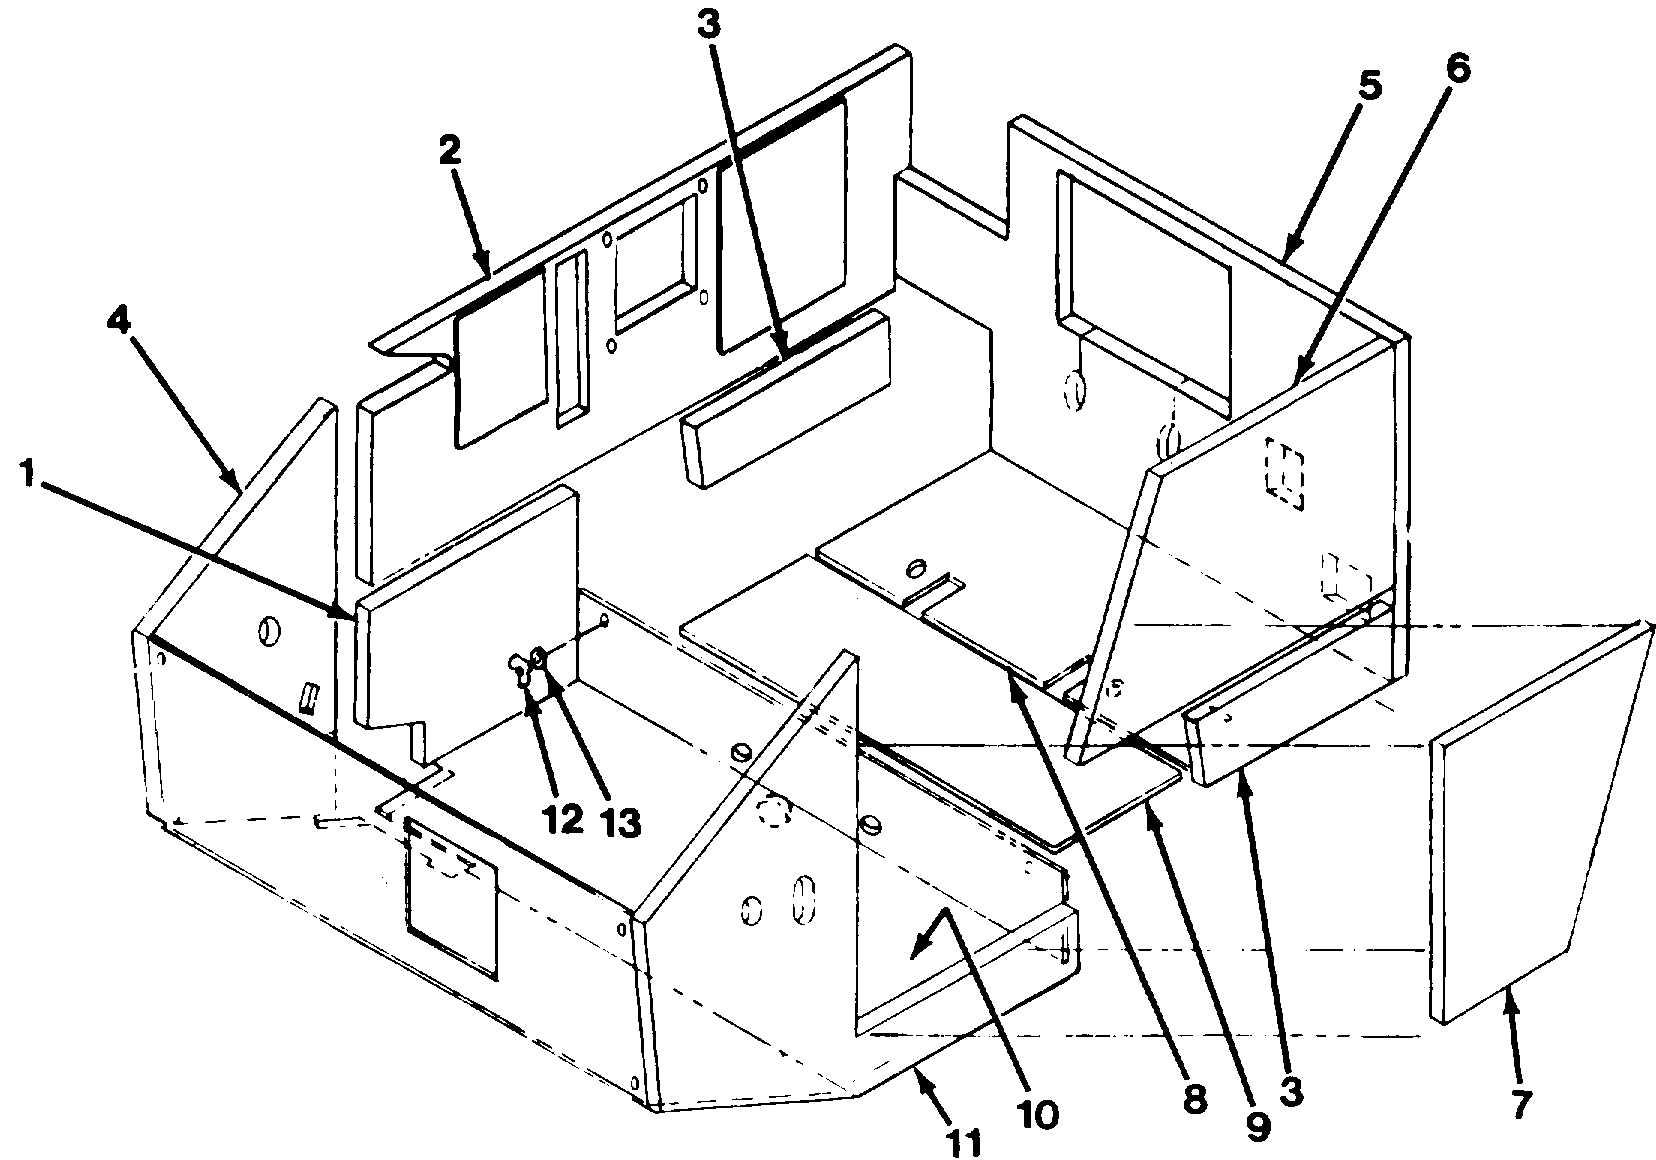 Figure 1110. Cab Insulation